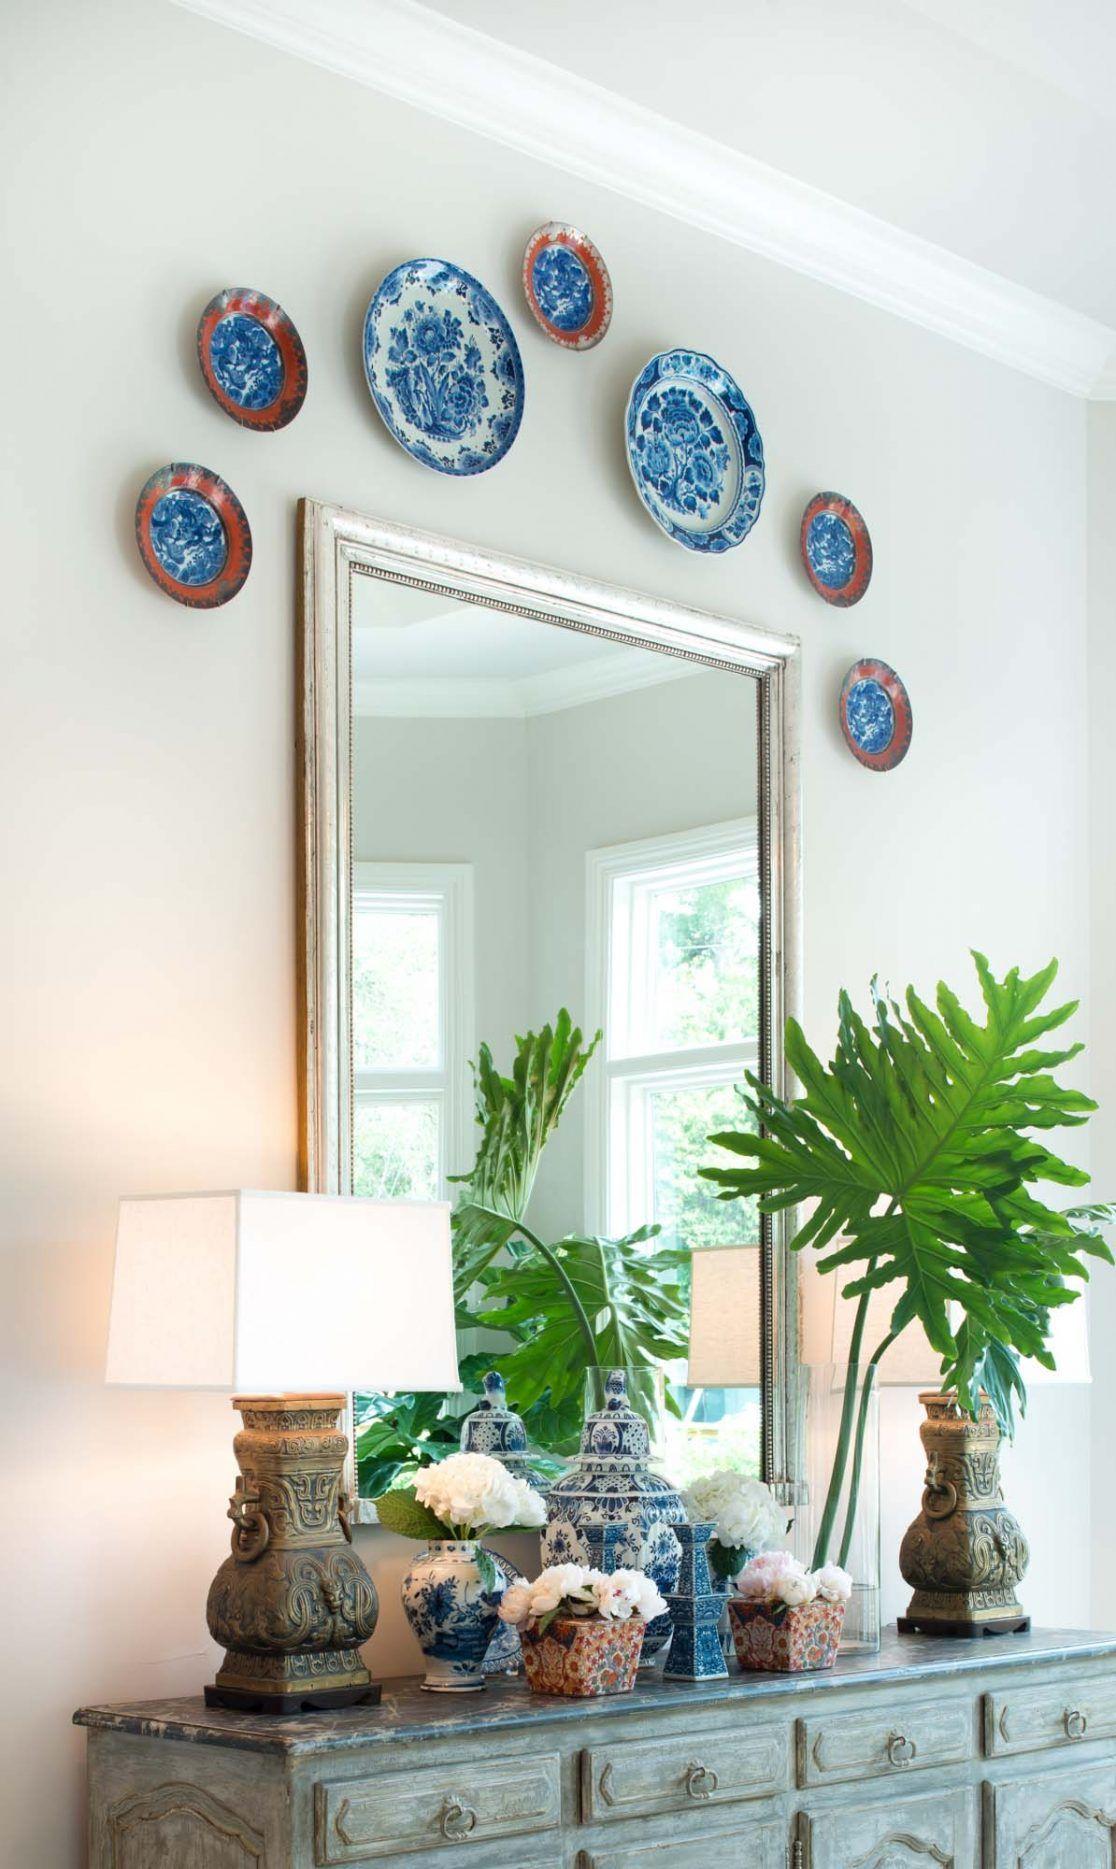 M Interiors | San Antonio, Texas | Interior Design Firm That Works On  Luxury Residences